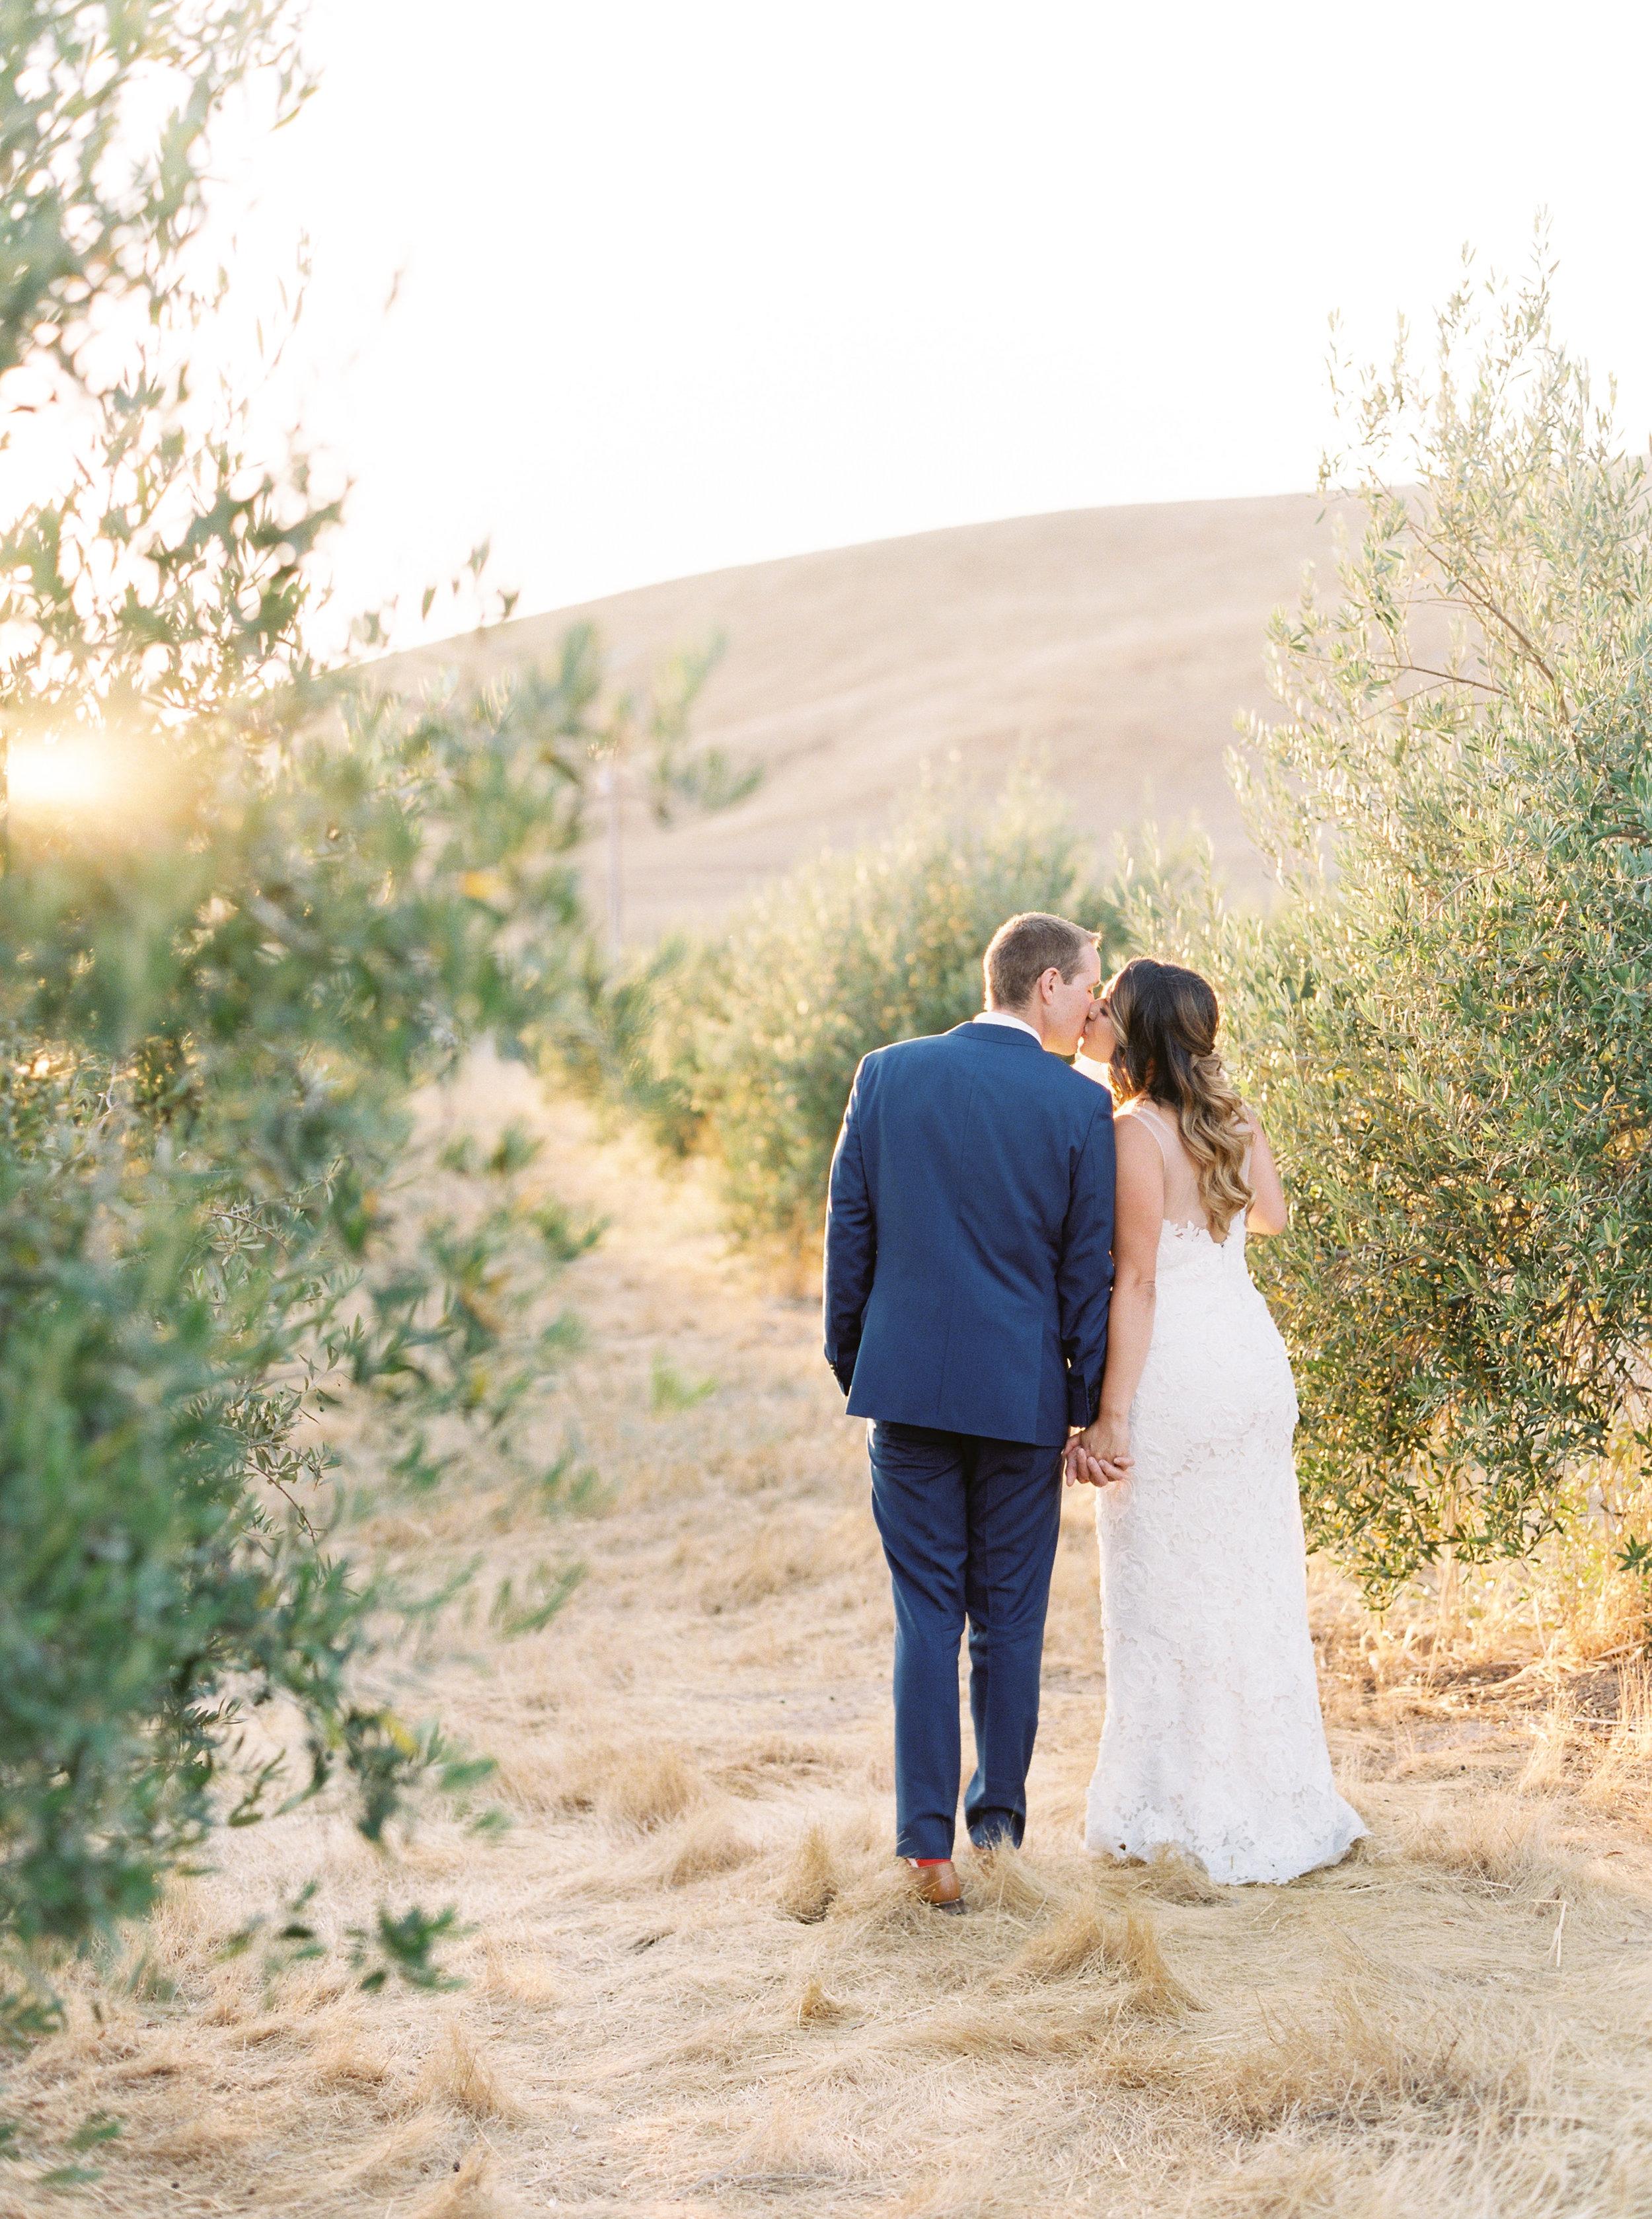 the-purple-orchid-resort-wedding-in-livermore-california-73.jpg